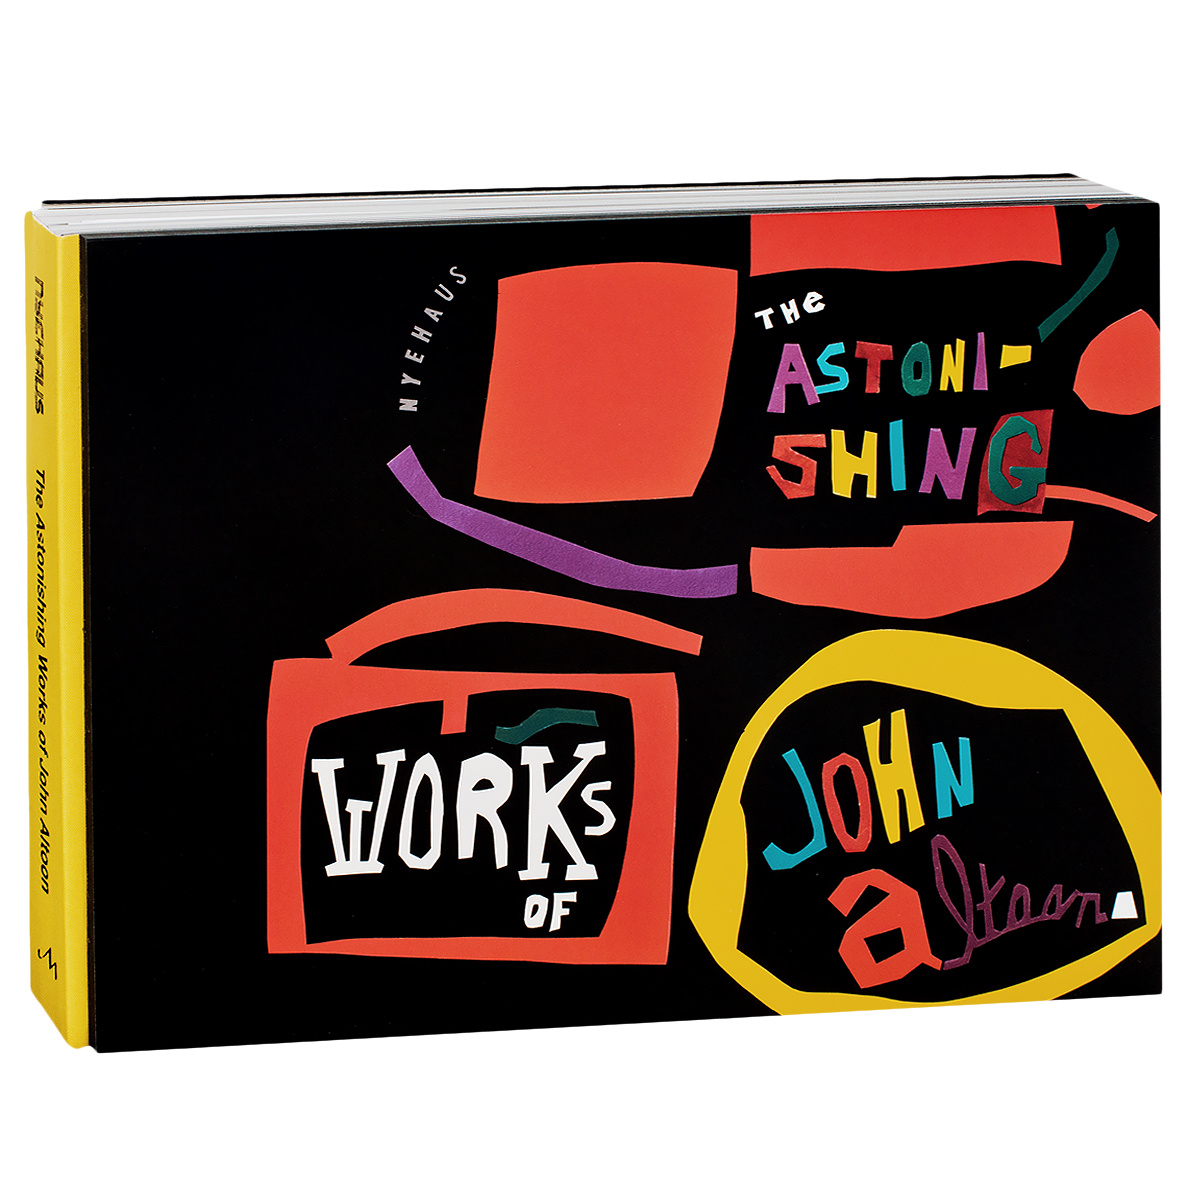 The Astonishing Works of John Altoon #1